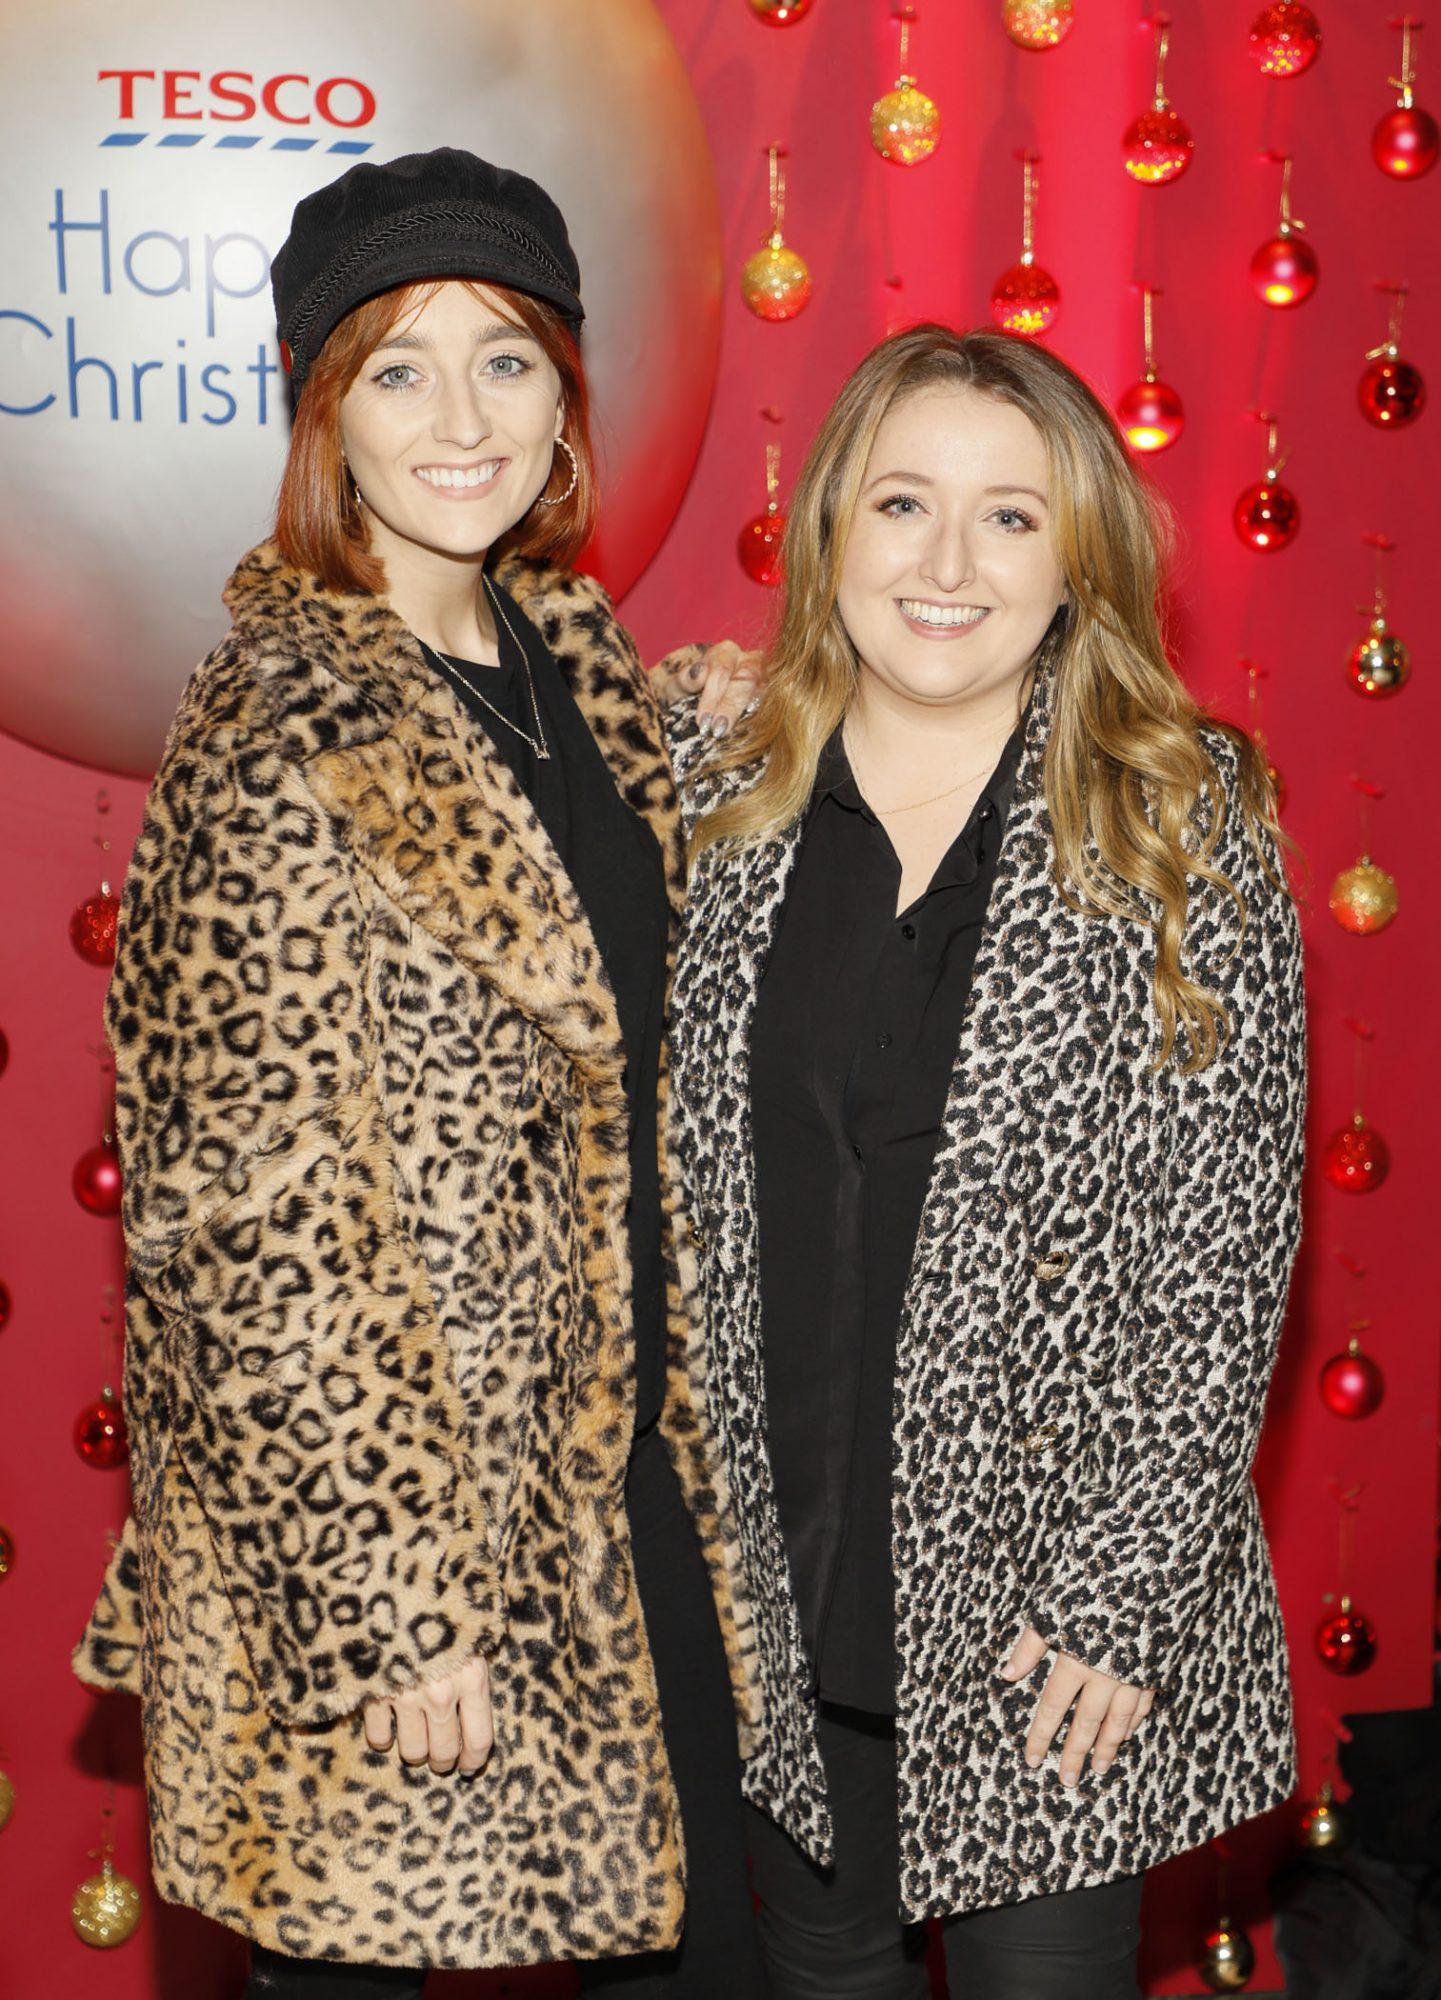 Hannah O'Connell and Rebecca Shekleton at the Tesco 2019 Christmas Showcase in Dublin's Iveagh Garden Hotel.   Photo: Kieran Harnett